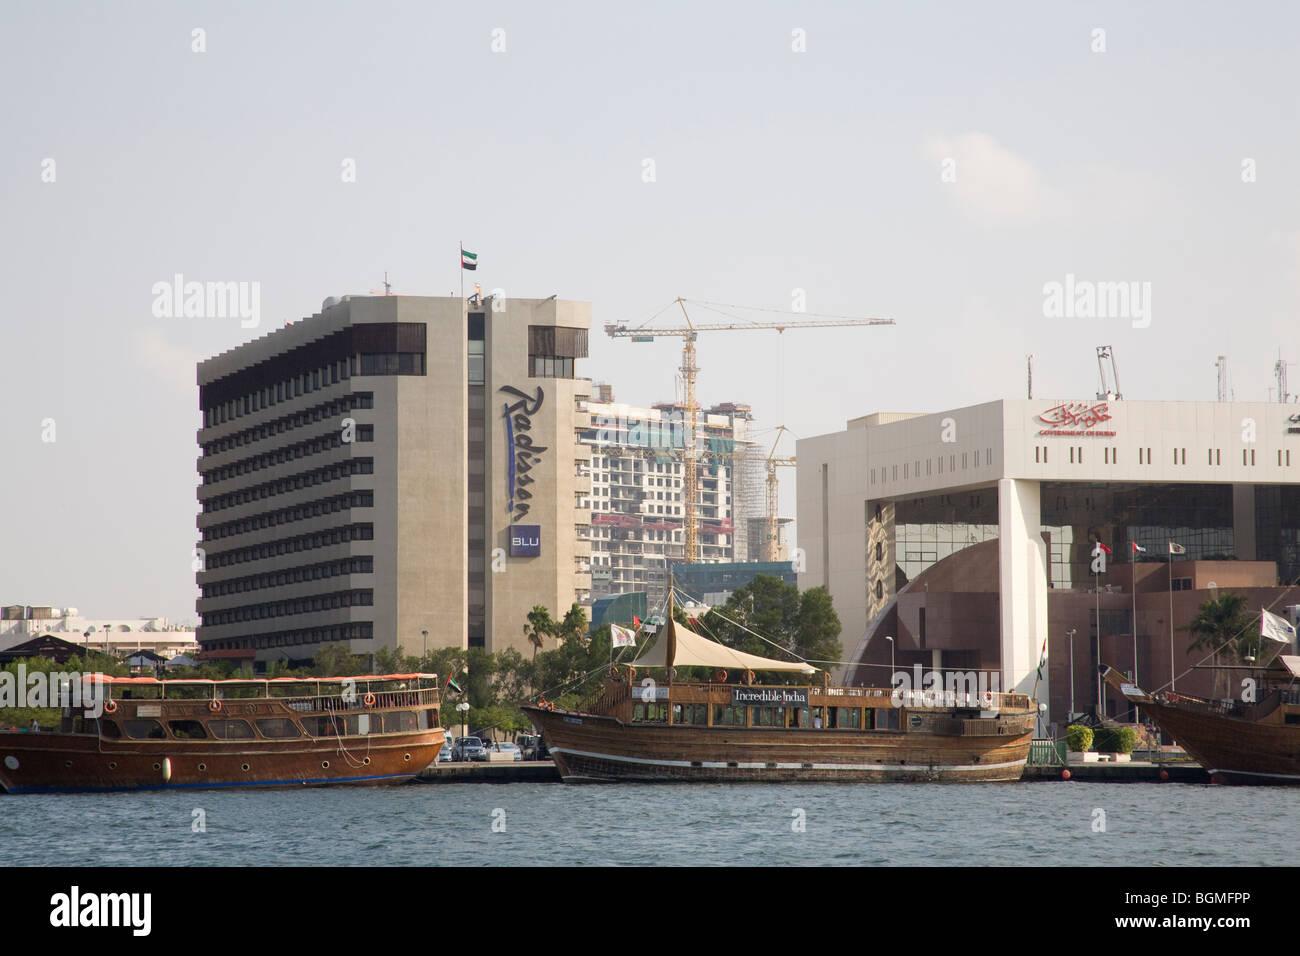 Dubai United Arab Emirates Construction work has stopped during the current economic crisis - Stock Image